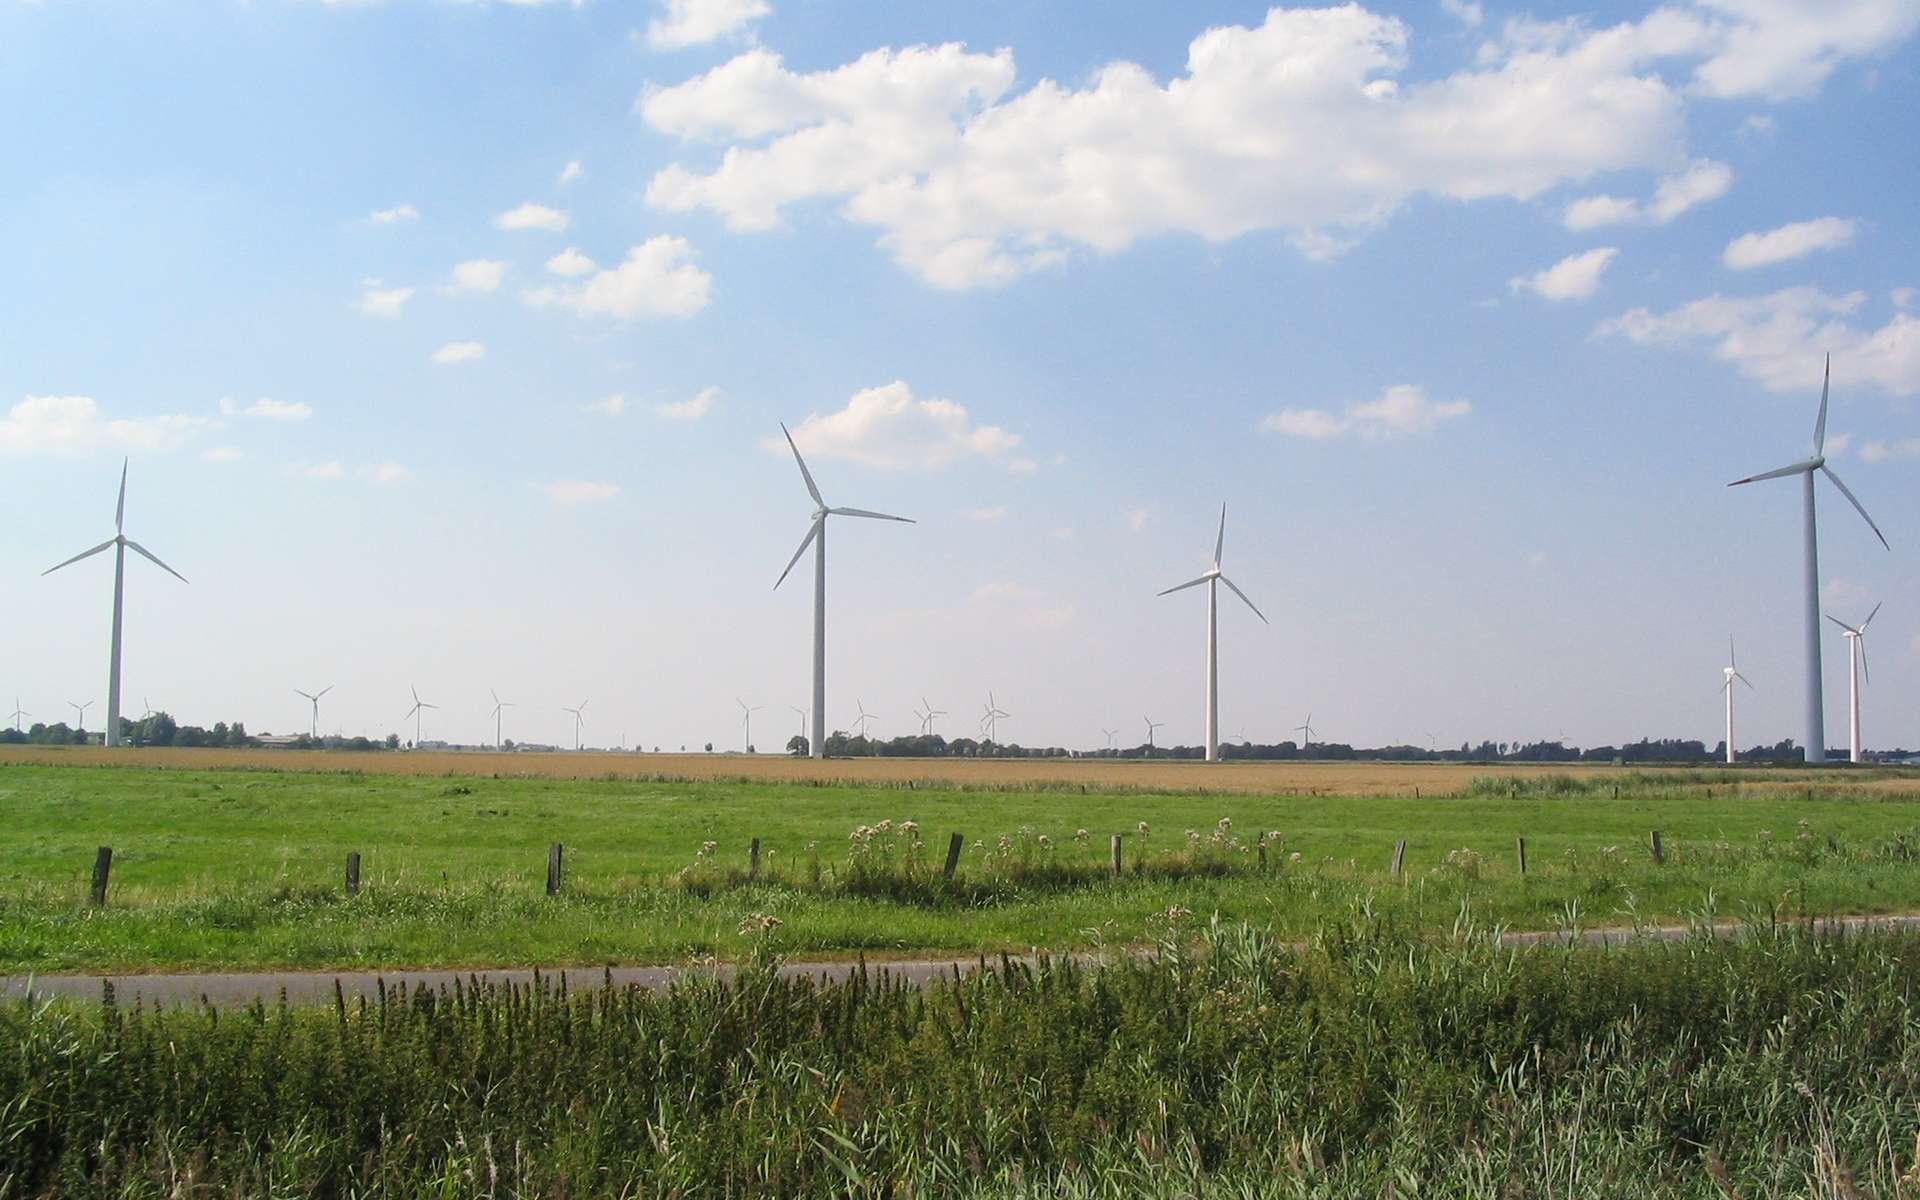 Éoliennes dans la campagne allemande. © Dirk Ingo Franke, Wikimedia Commons, cc by sa 1.0